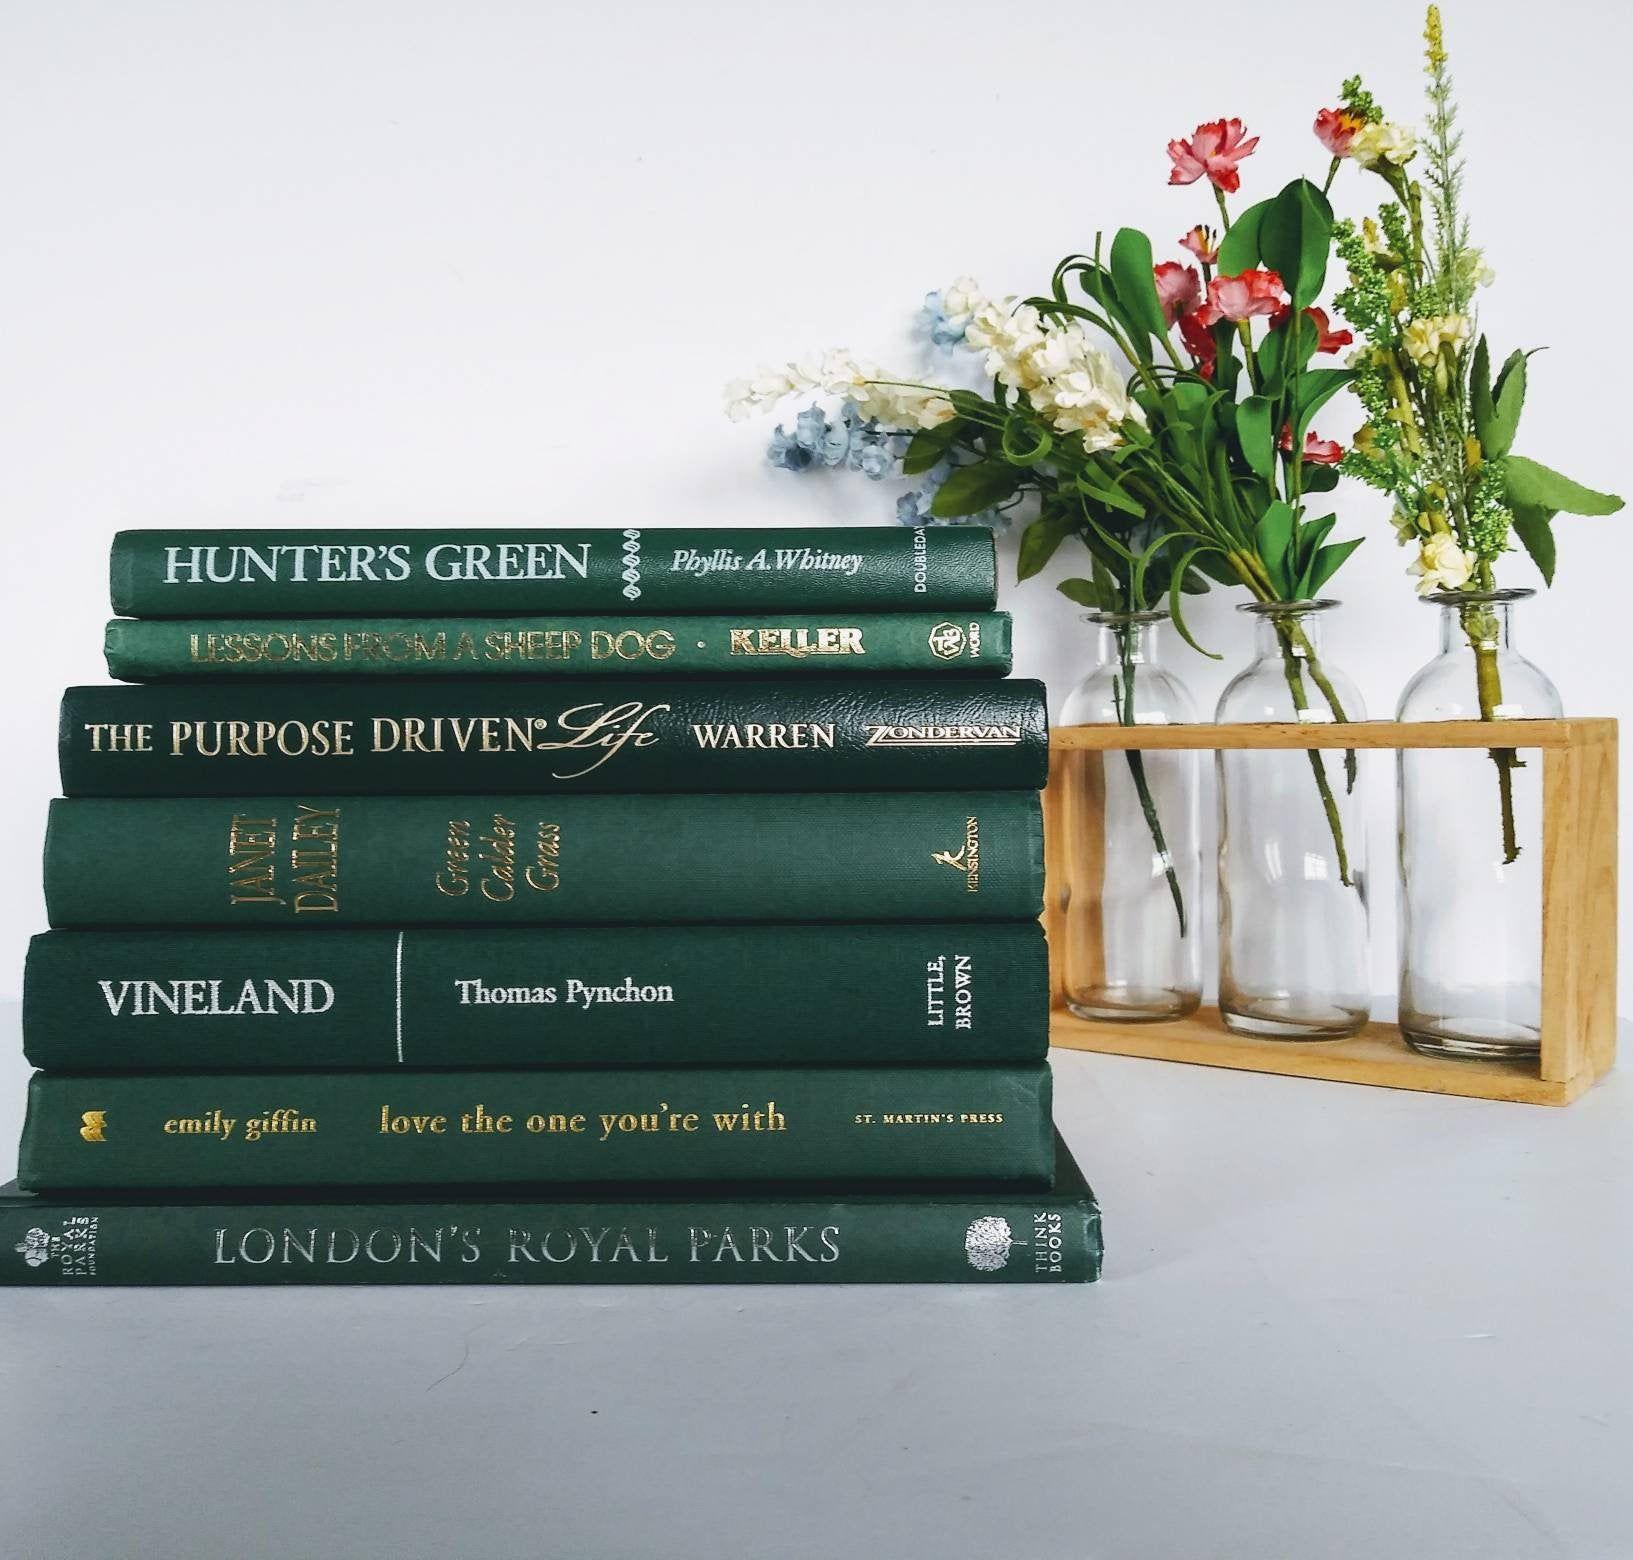 Green Books Dark Green Books Coffee Table Book 7 Books In Etsy Green Books Coffee Table Books Green Coffee Tables [ 1560 x 1633 Pixel ]